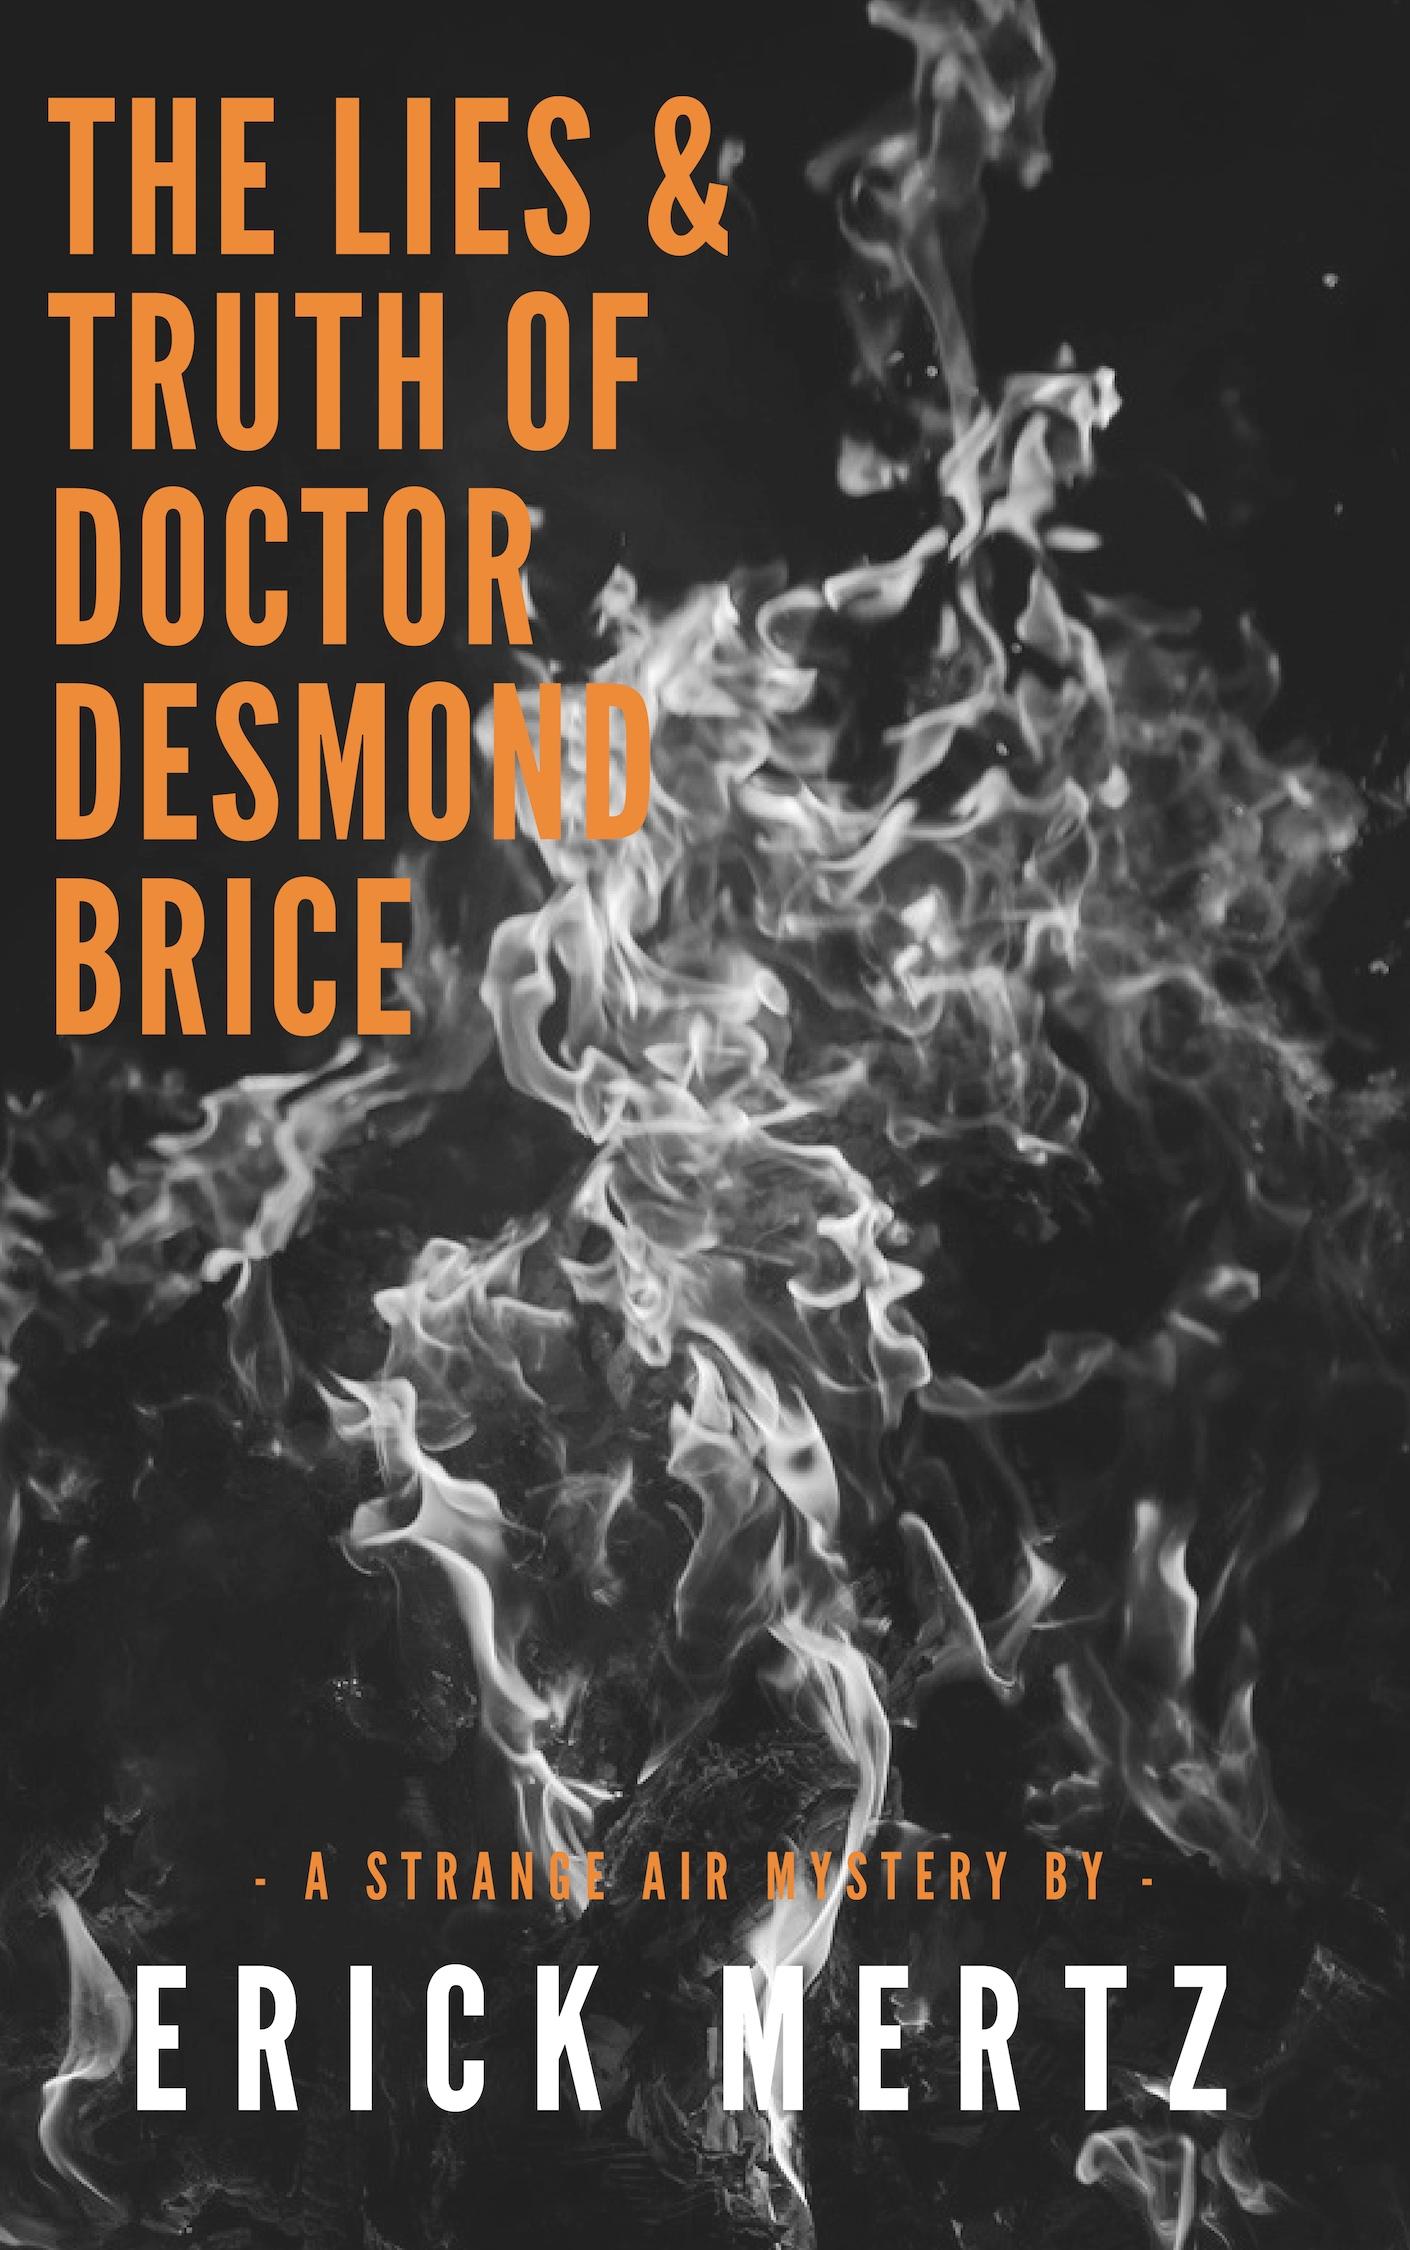 The-Lies-Truth-Of-Doctor-Desmond-Brice-Play.jpg